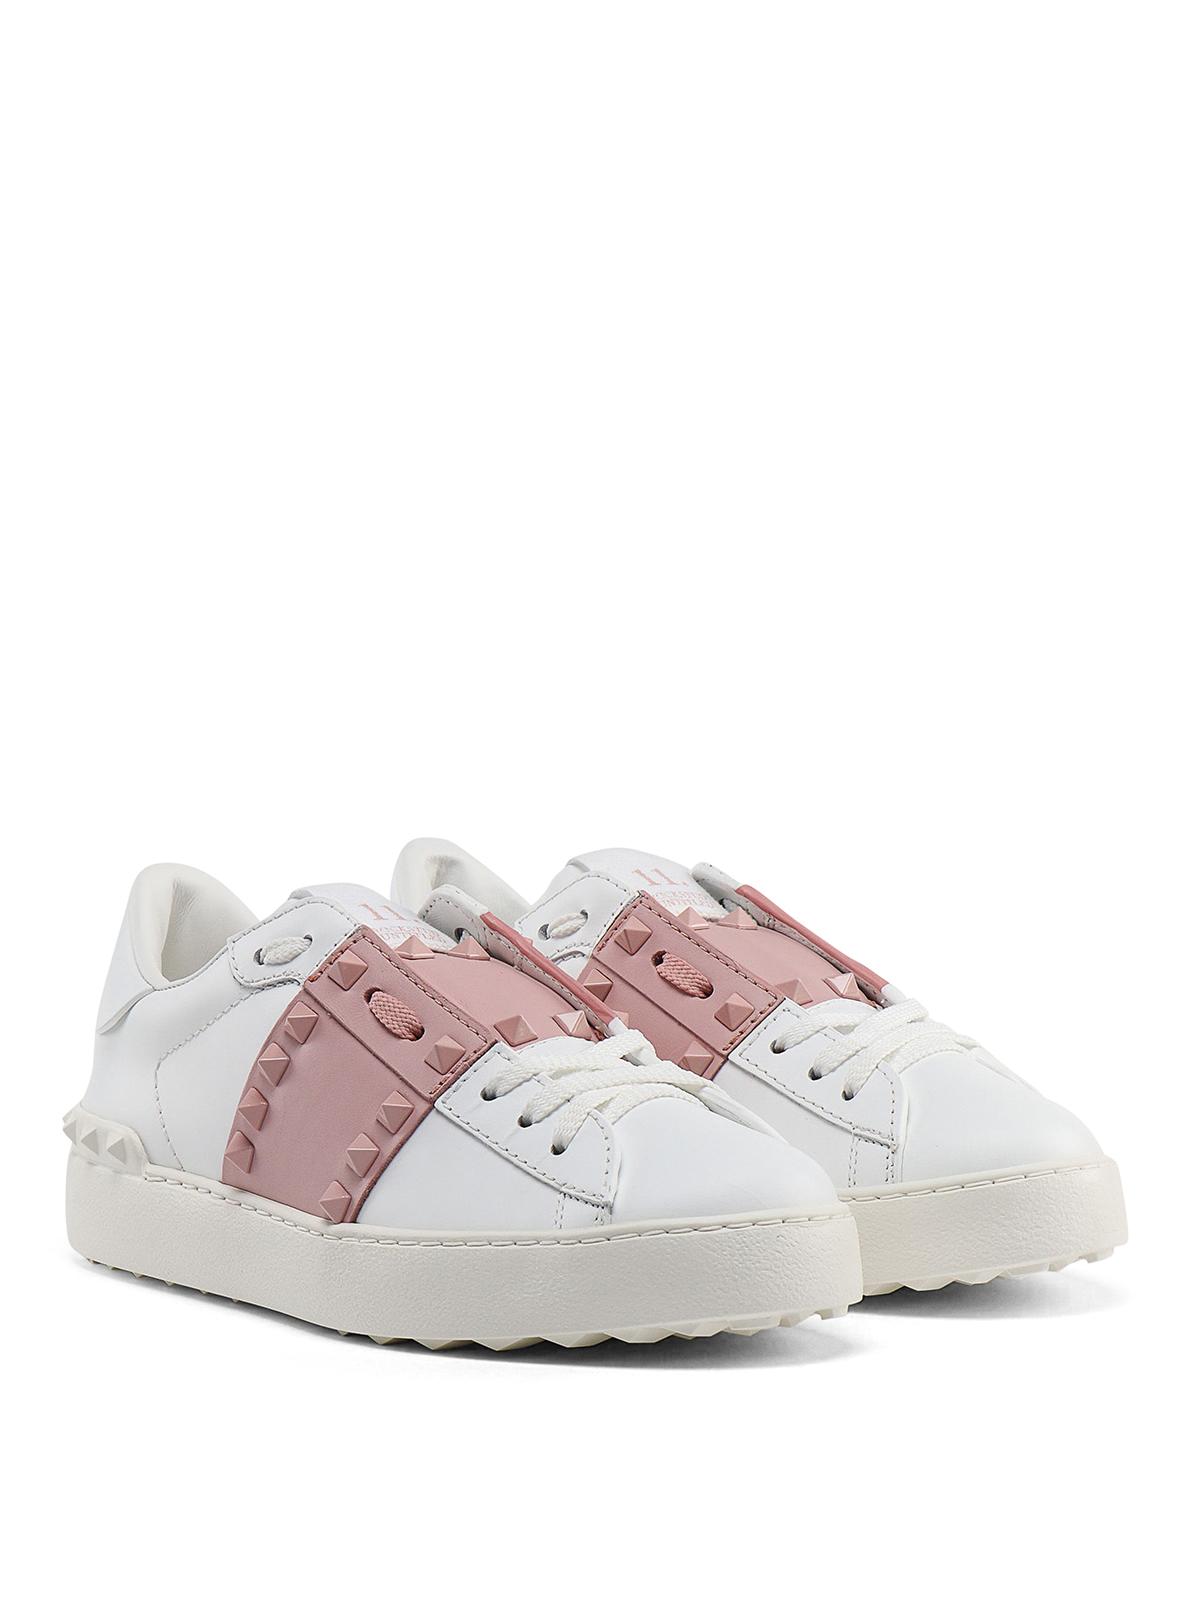 valentino garavani pink shoes